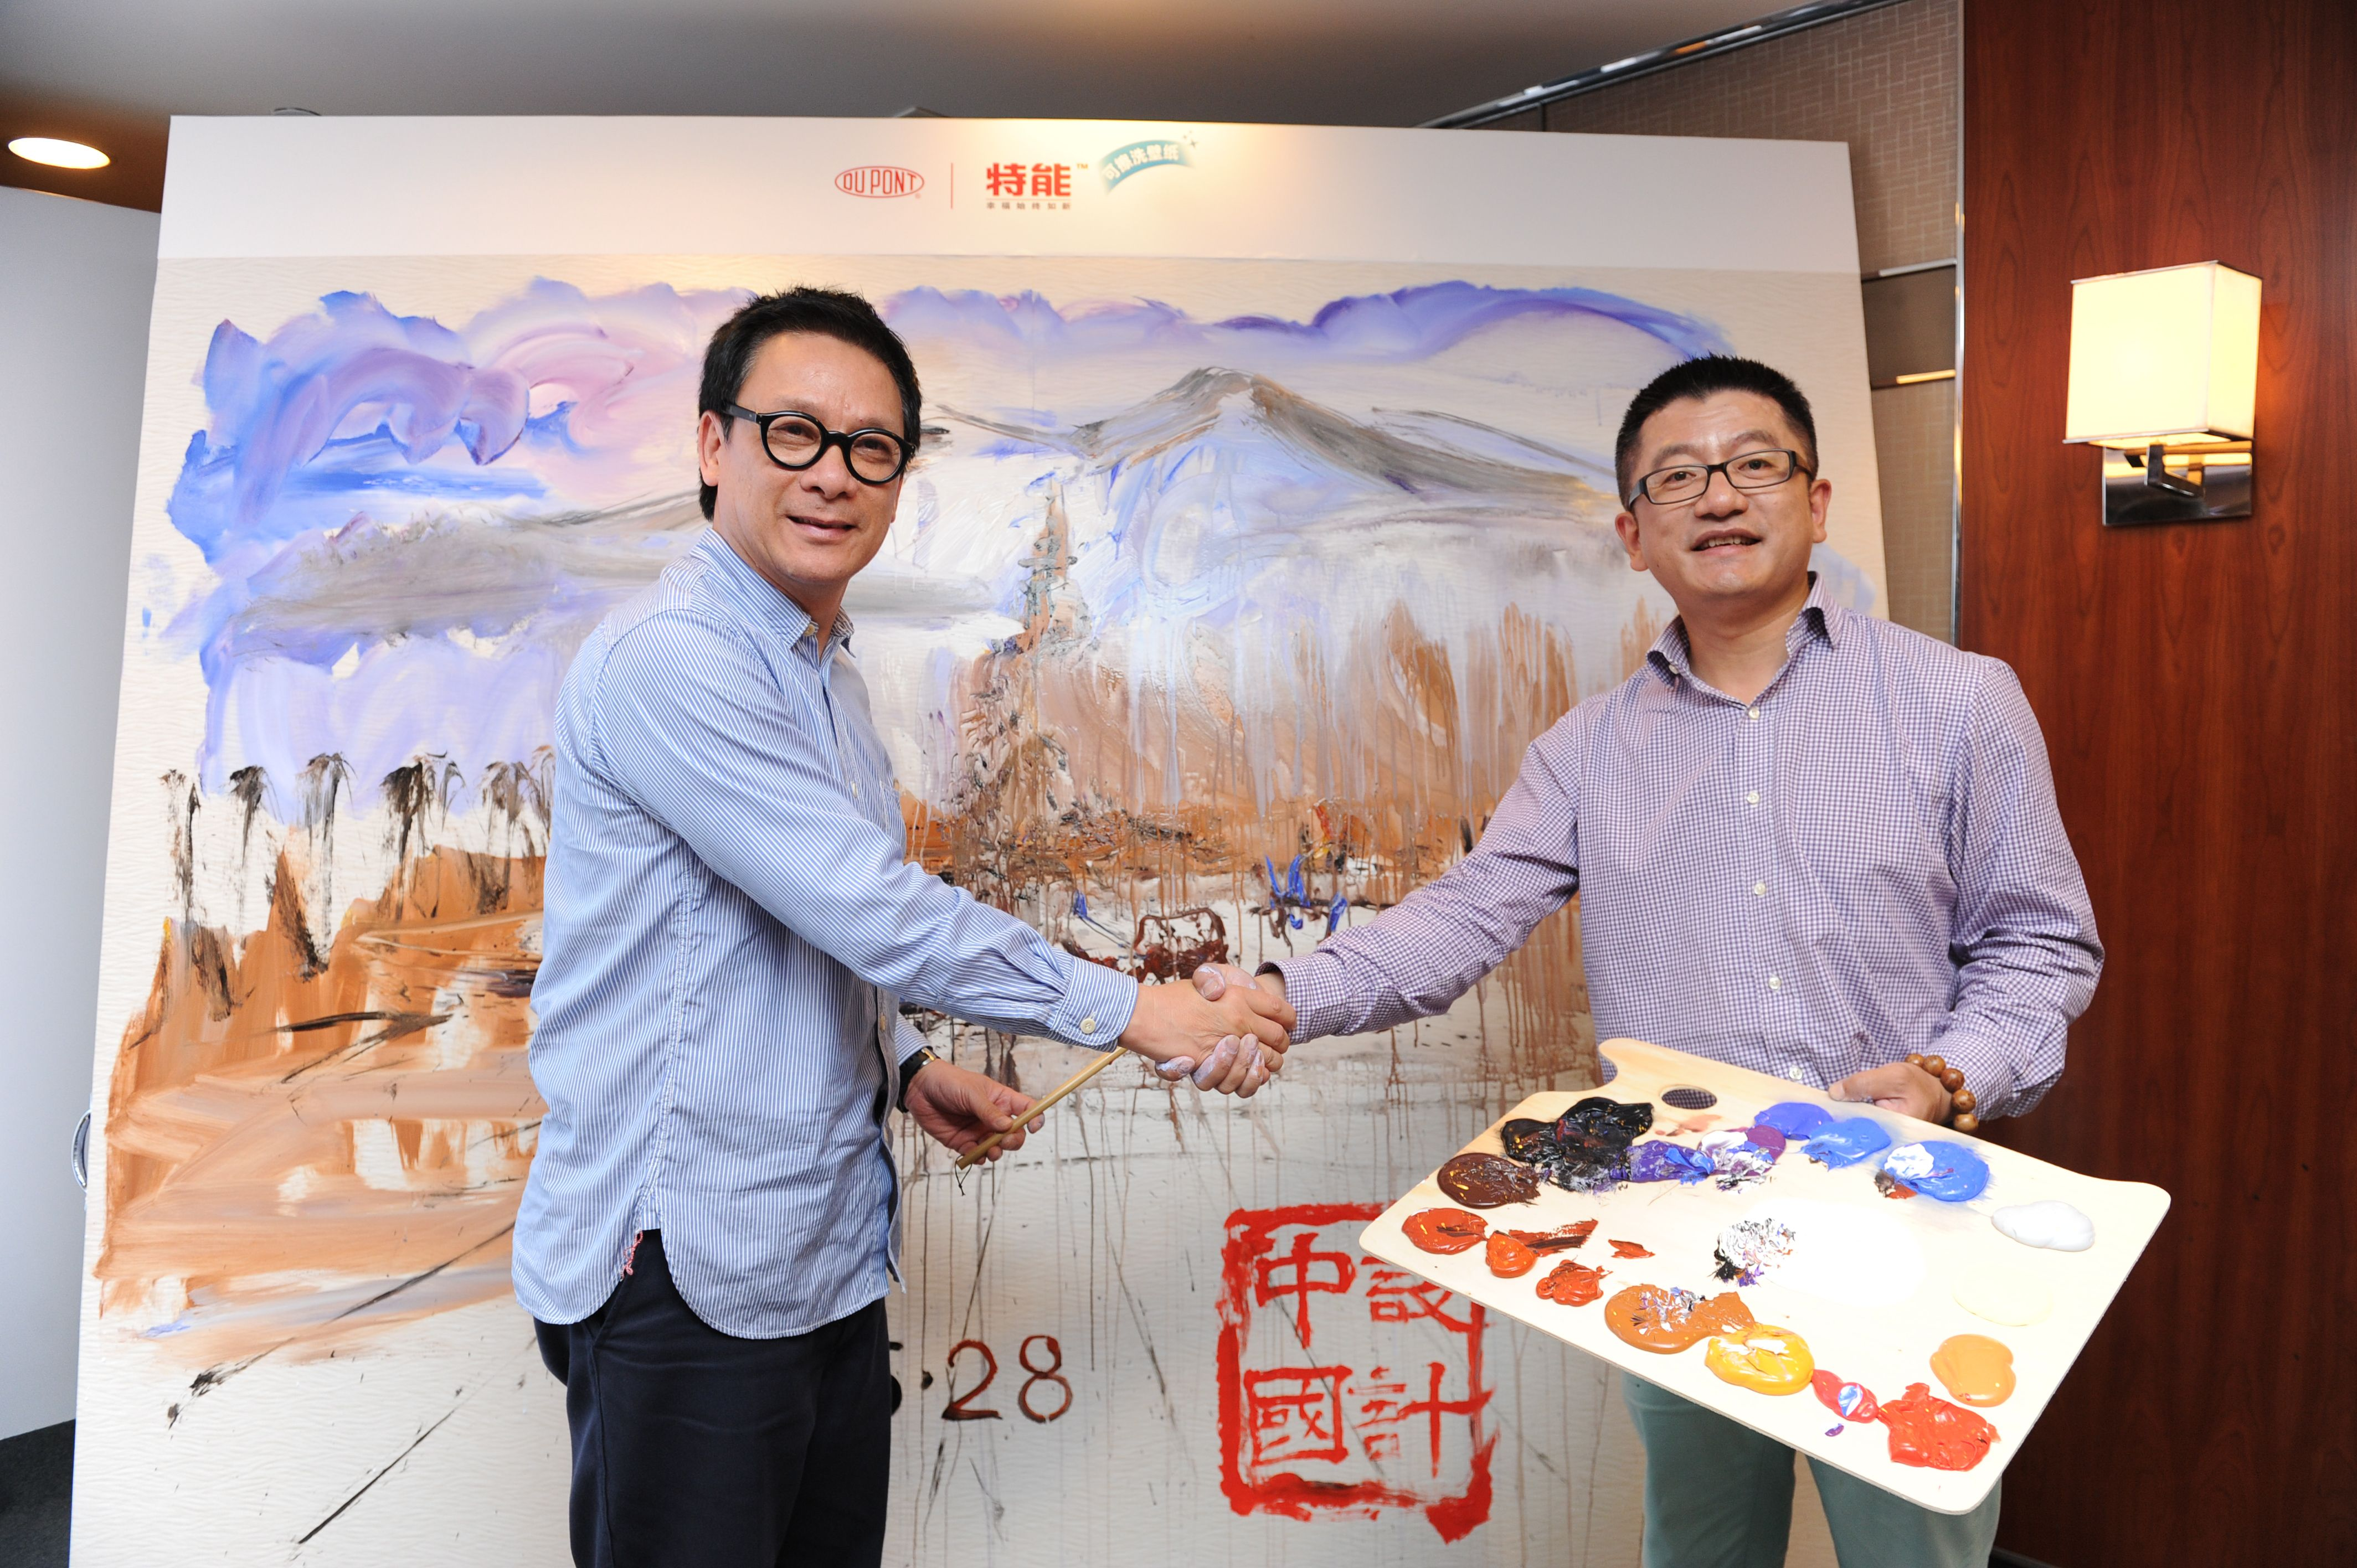 IFI候任主席、设计大师梁志天先生与上海师范大学美术学院的油画家宋巍老师在贴了特能™ 可擦洗壁纸的墙面上即兴作画。